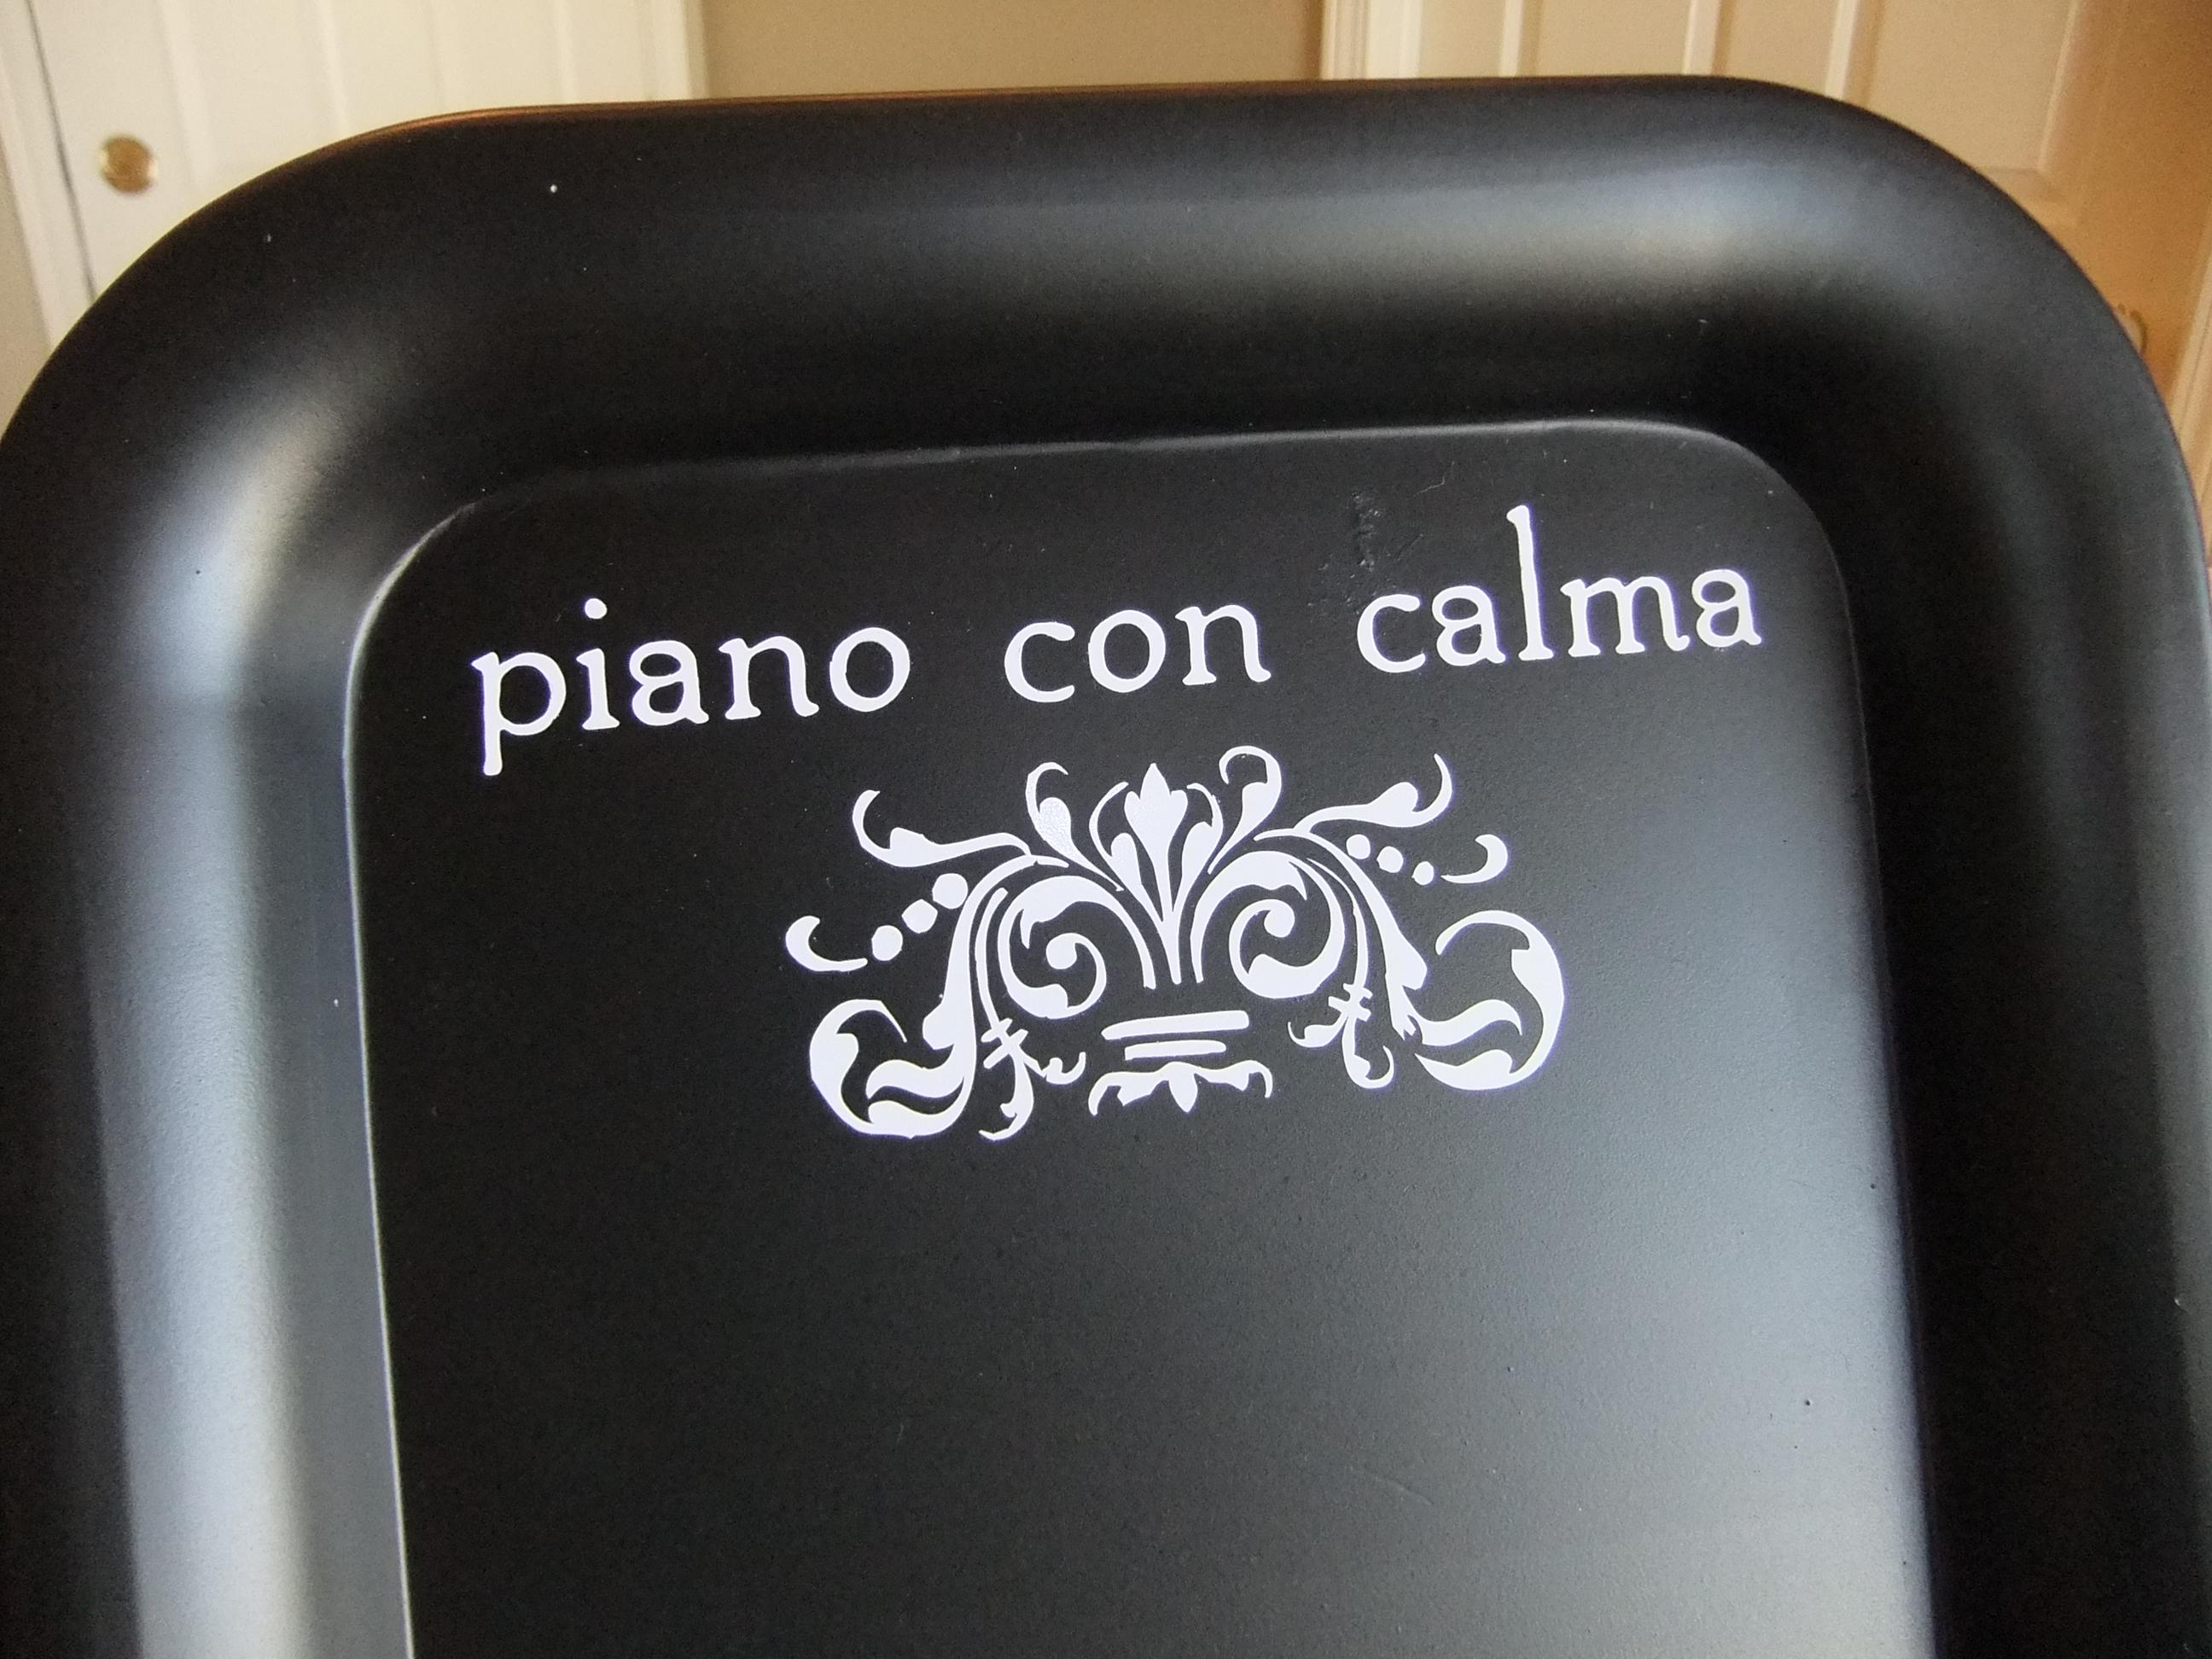 Piano con calma